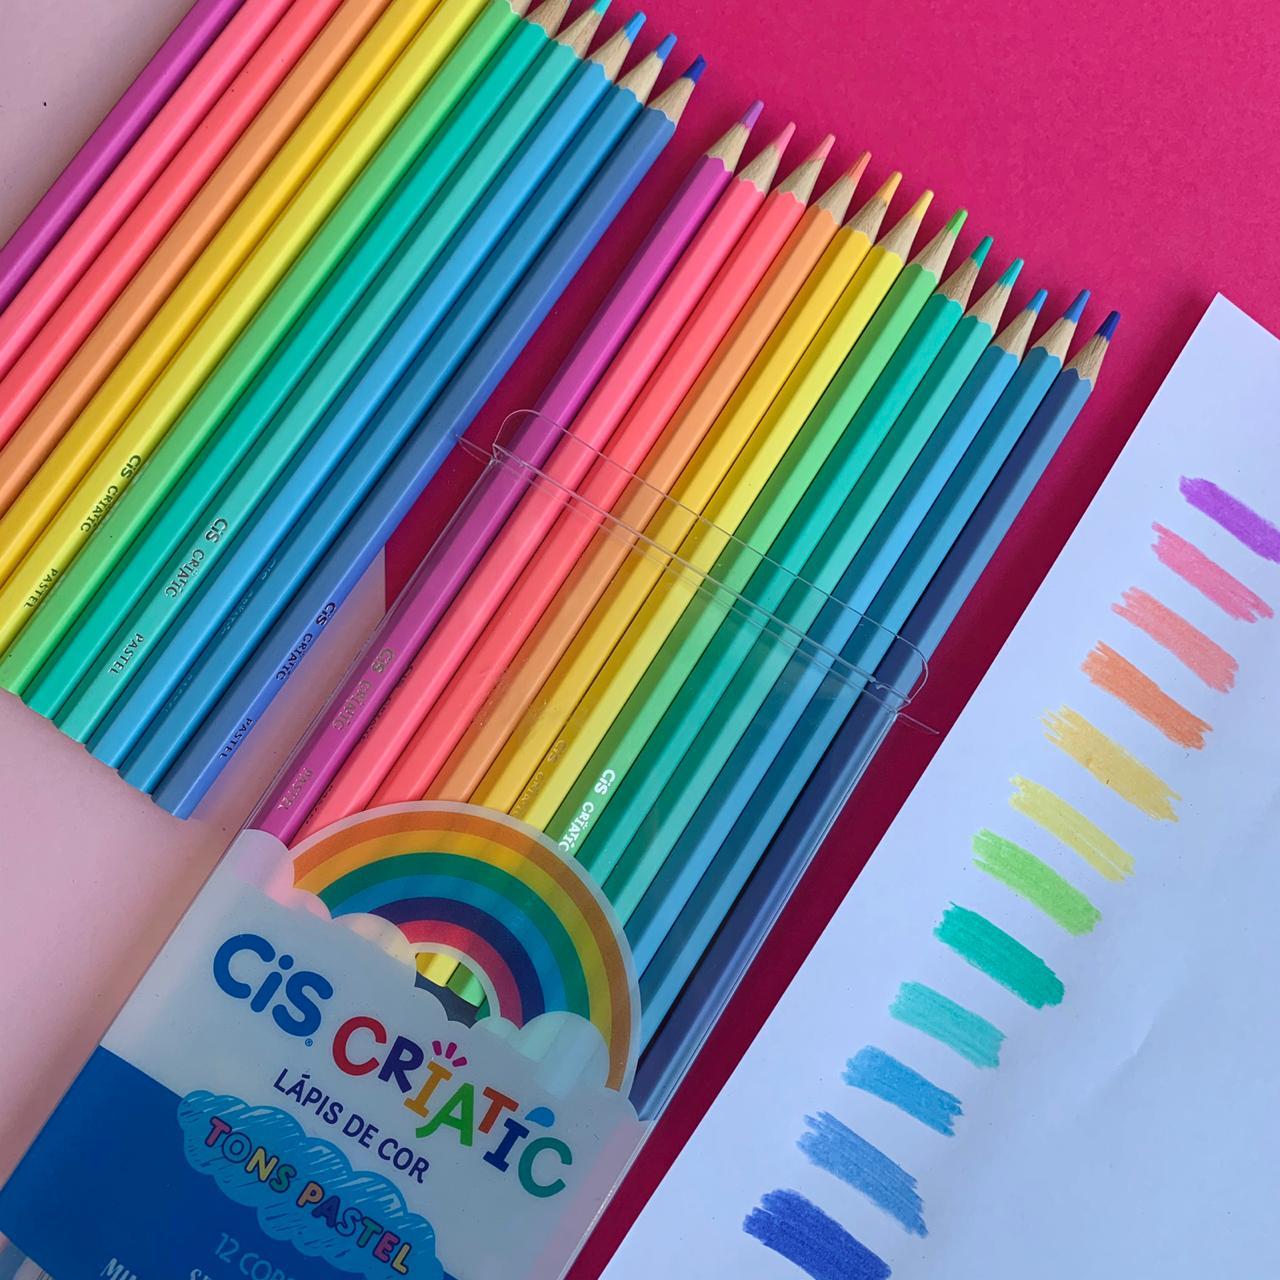 Lápis de cor Criatic Tons Pastel 12 Unidades | CiS